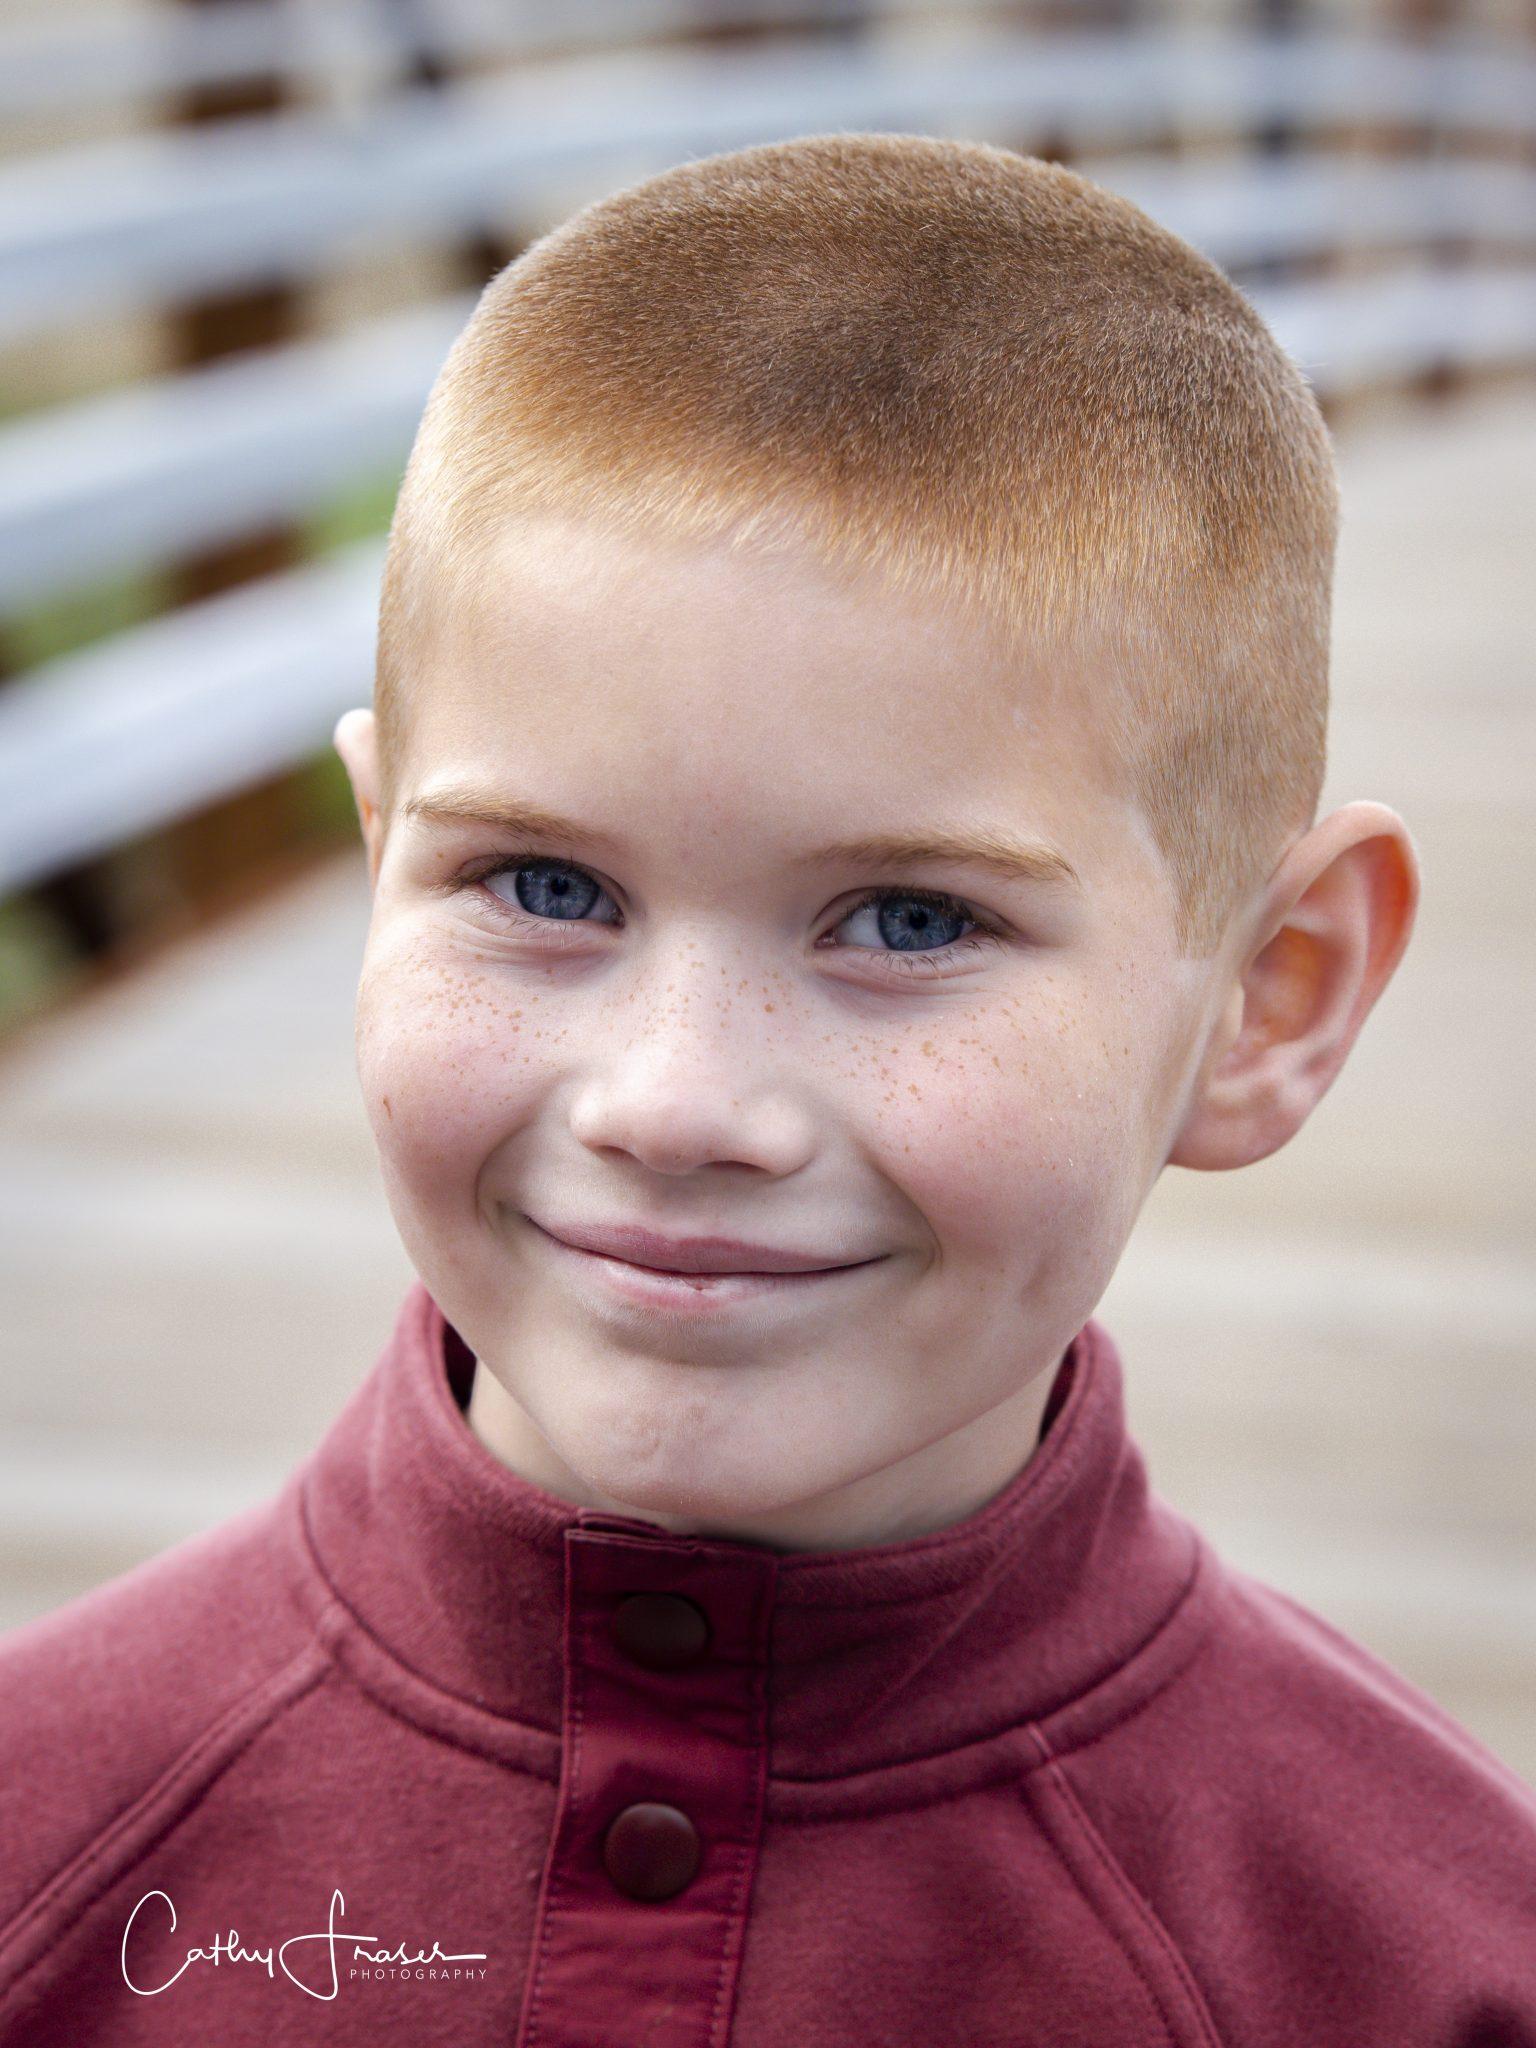 Young boy, professional headshot, Penn Yan, New York, natural light, standing on footbridge wearing red sweater